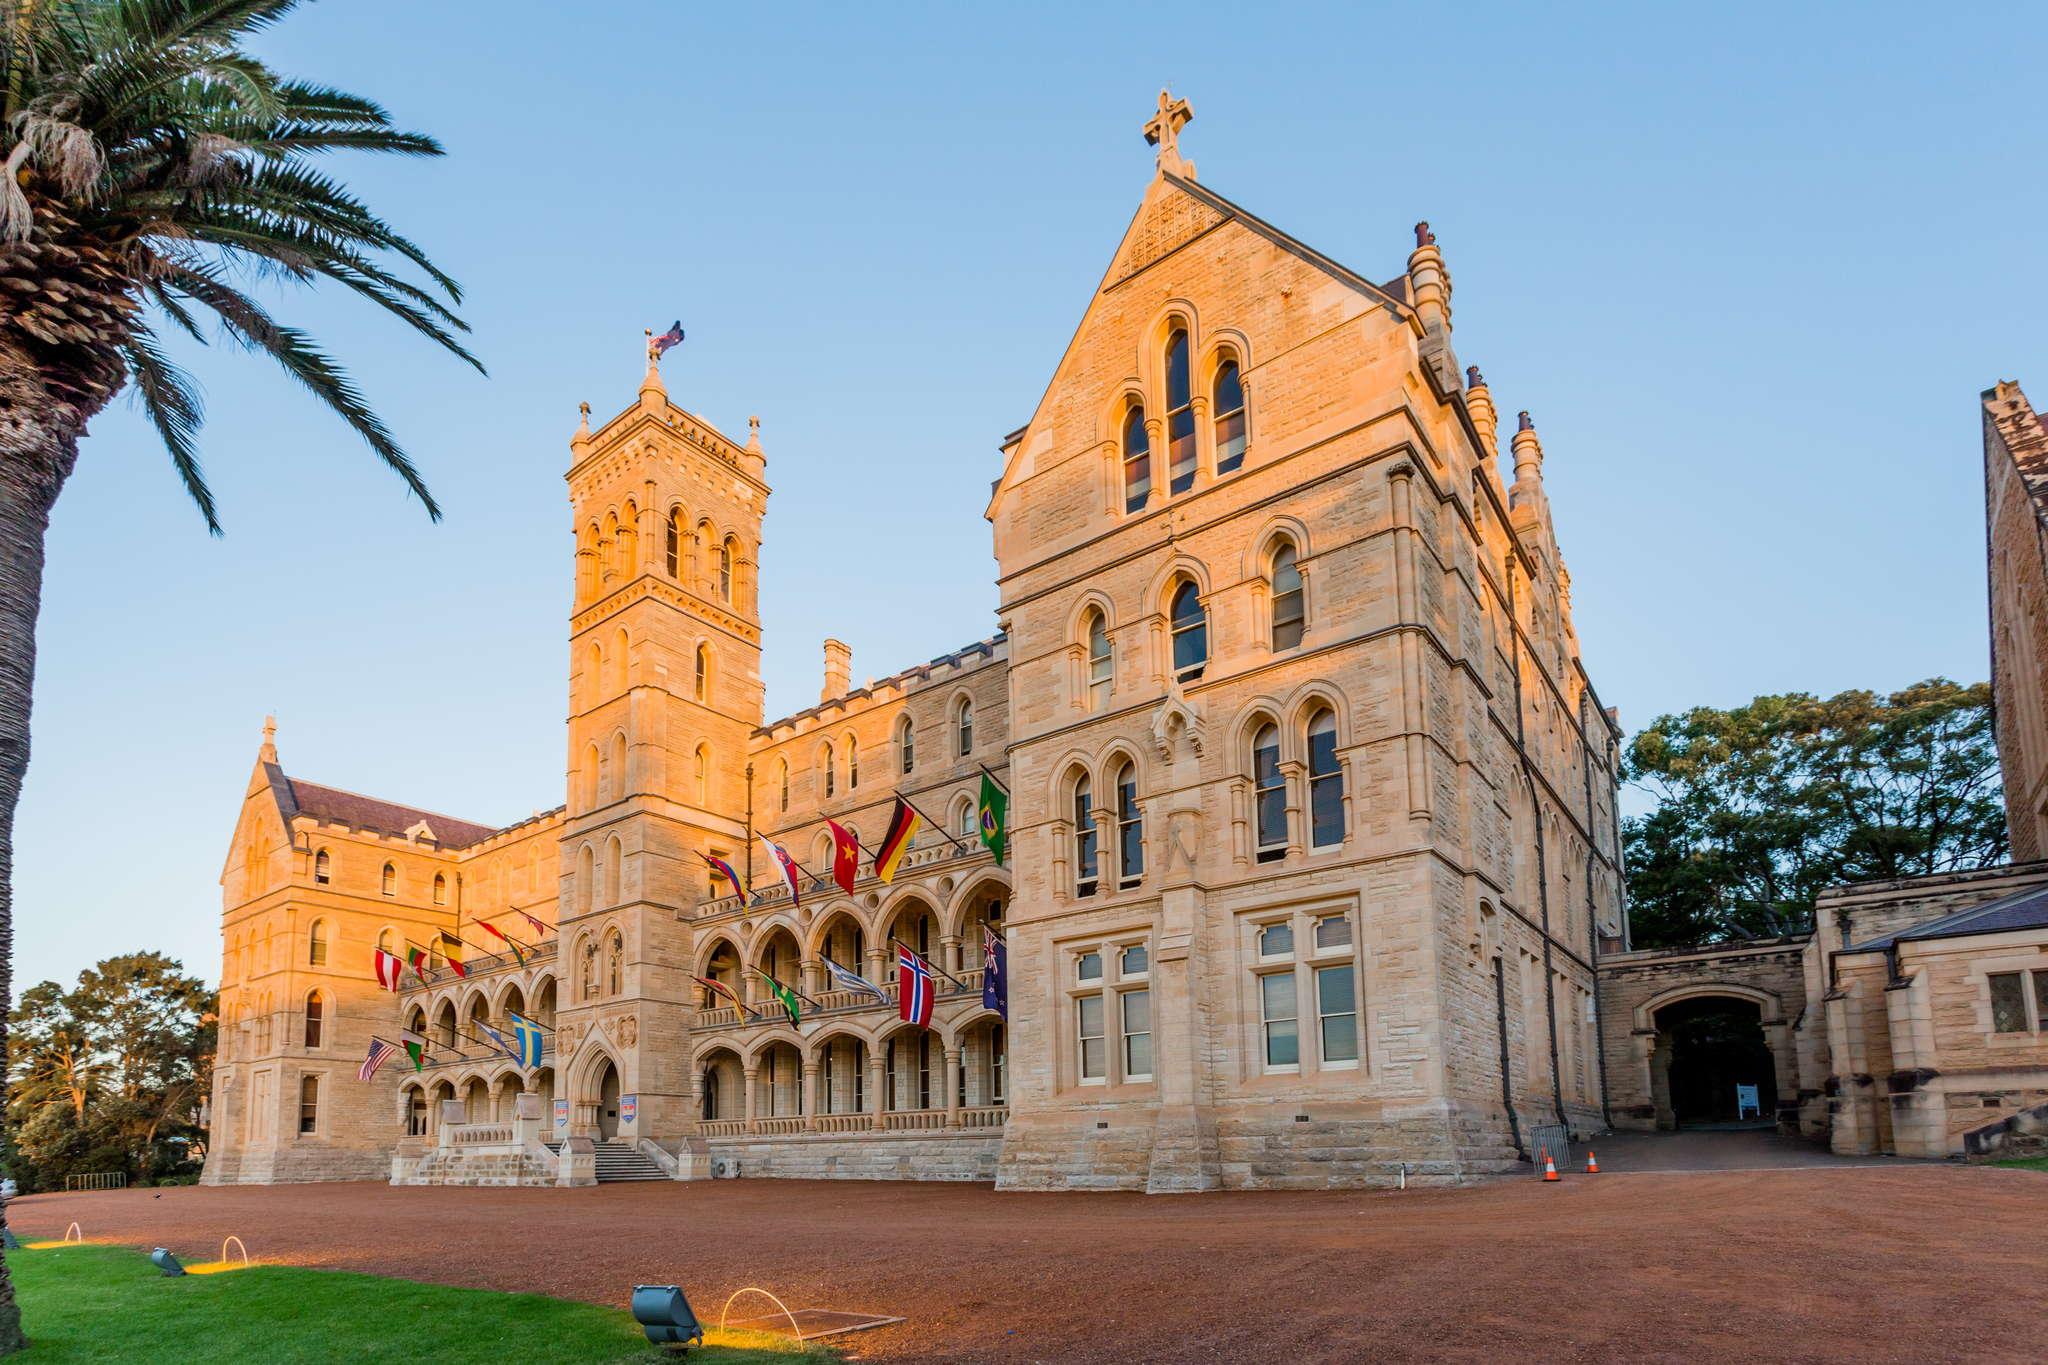 International_College_of_Management_Sydney_1_140224_ICMSMANLY-83